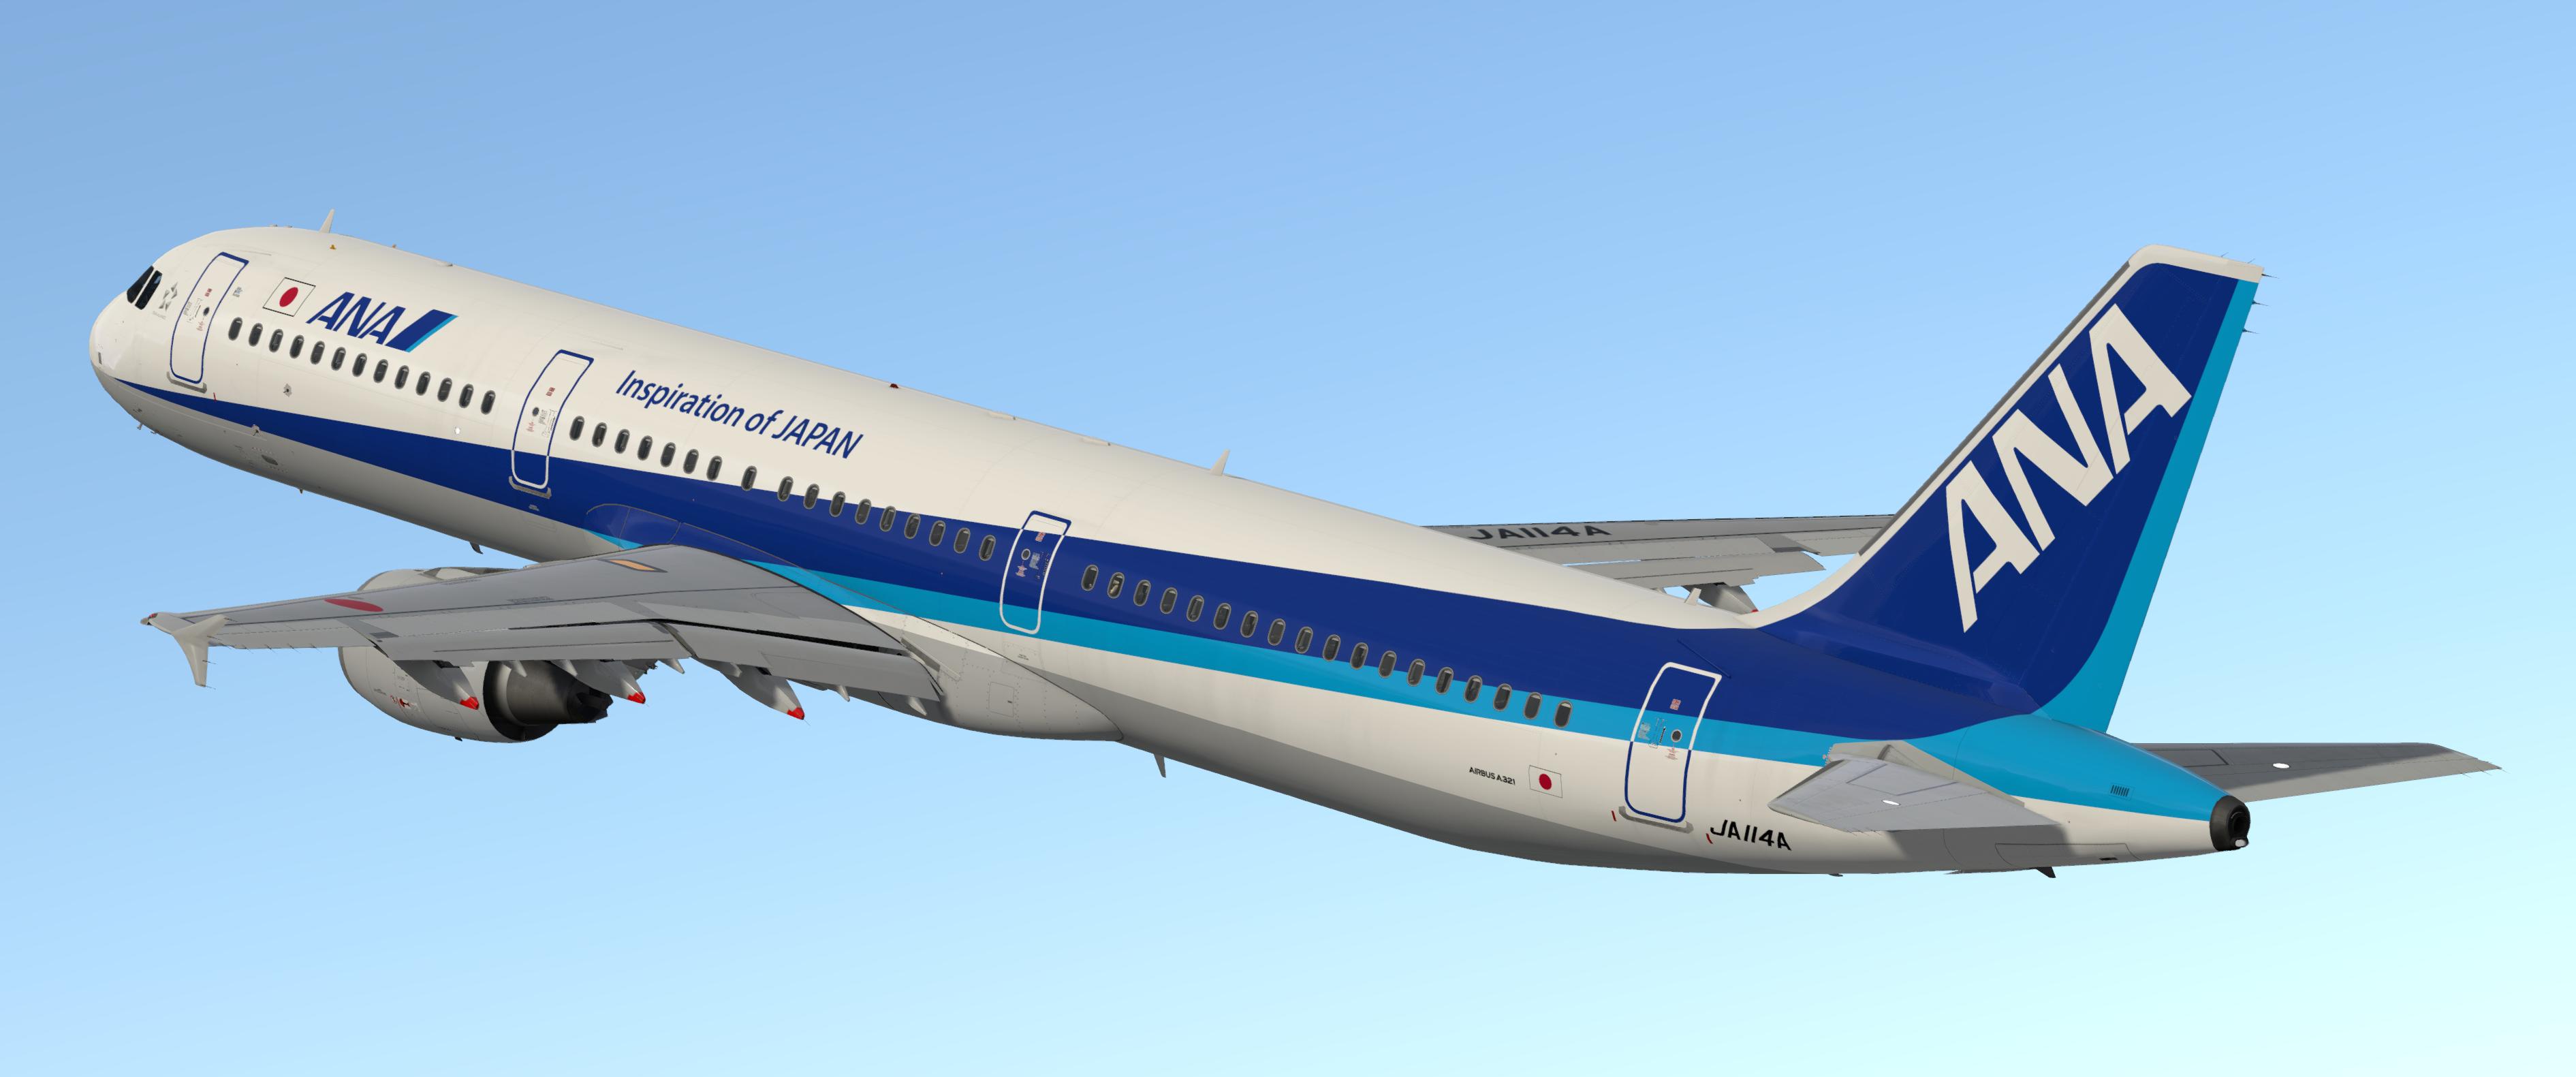 JA114A-20.PNG